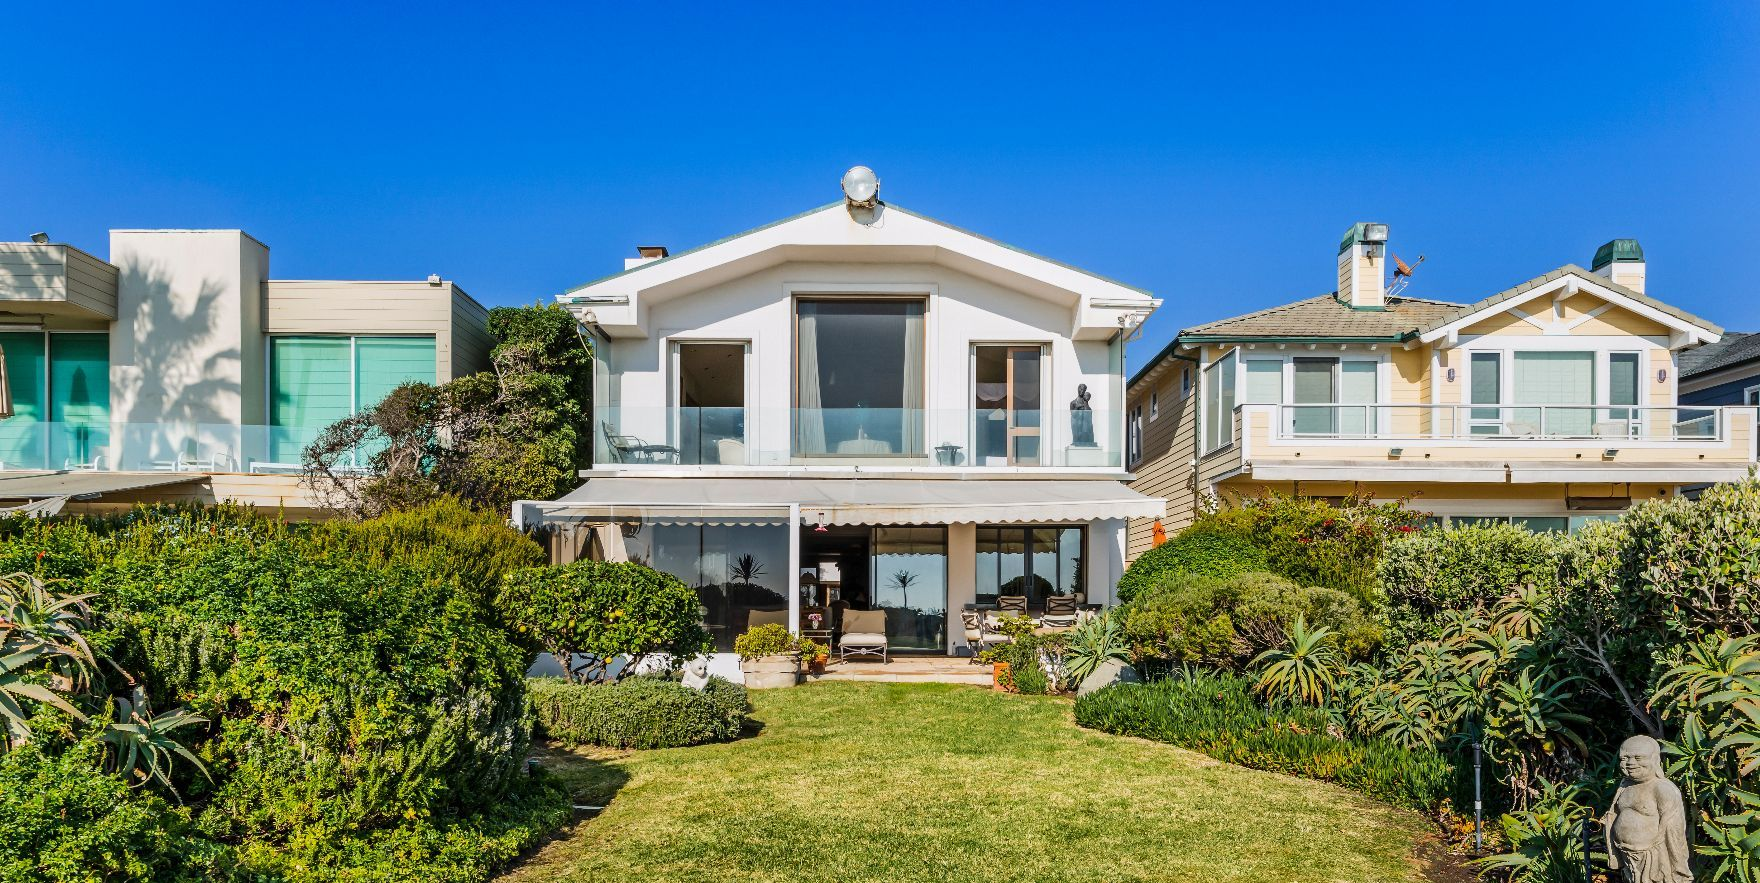 Frank Sinatra's Malibu Beach House Is On the Market for $12.9 Million